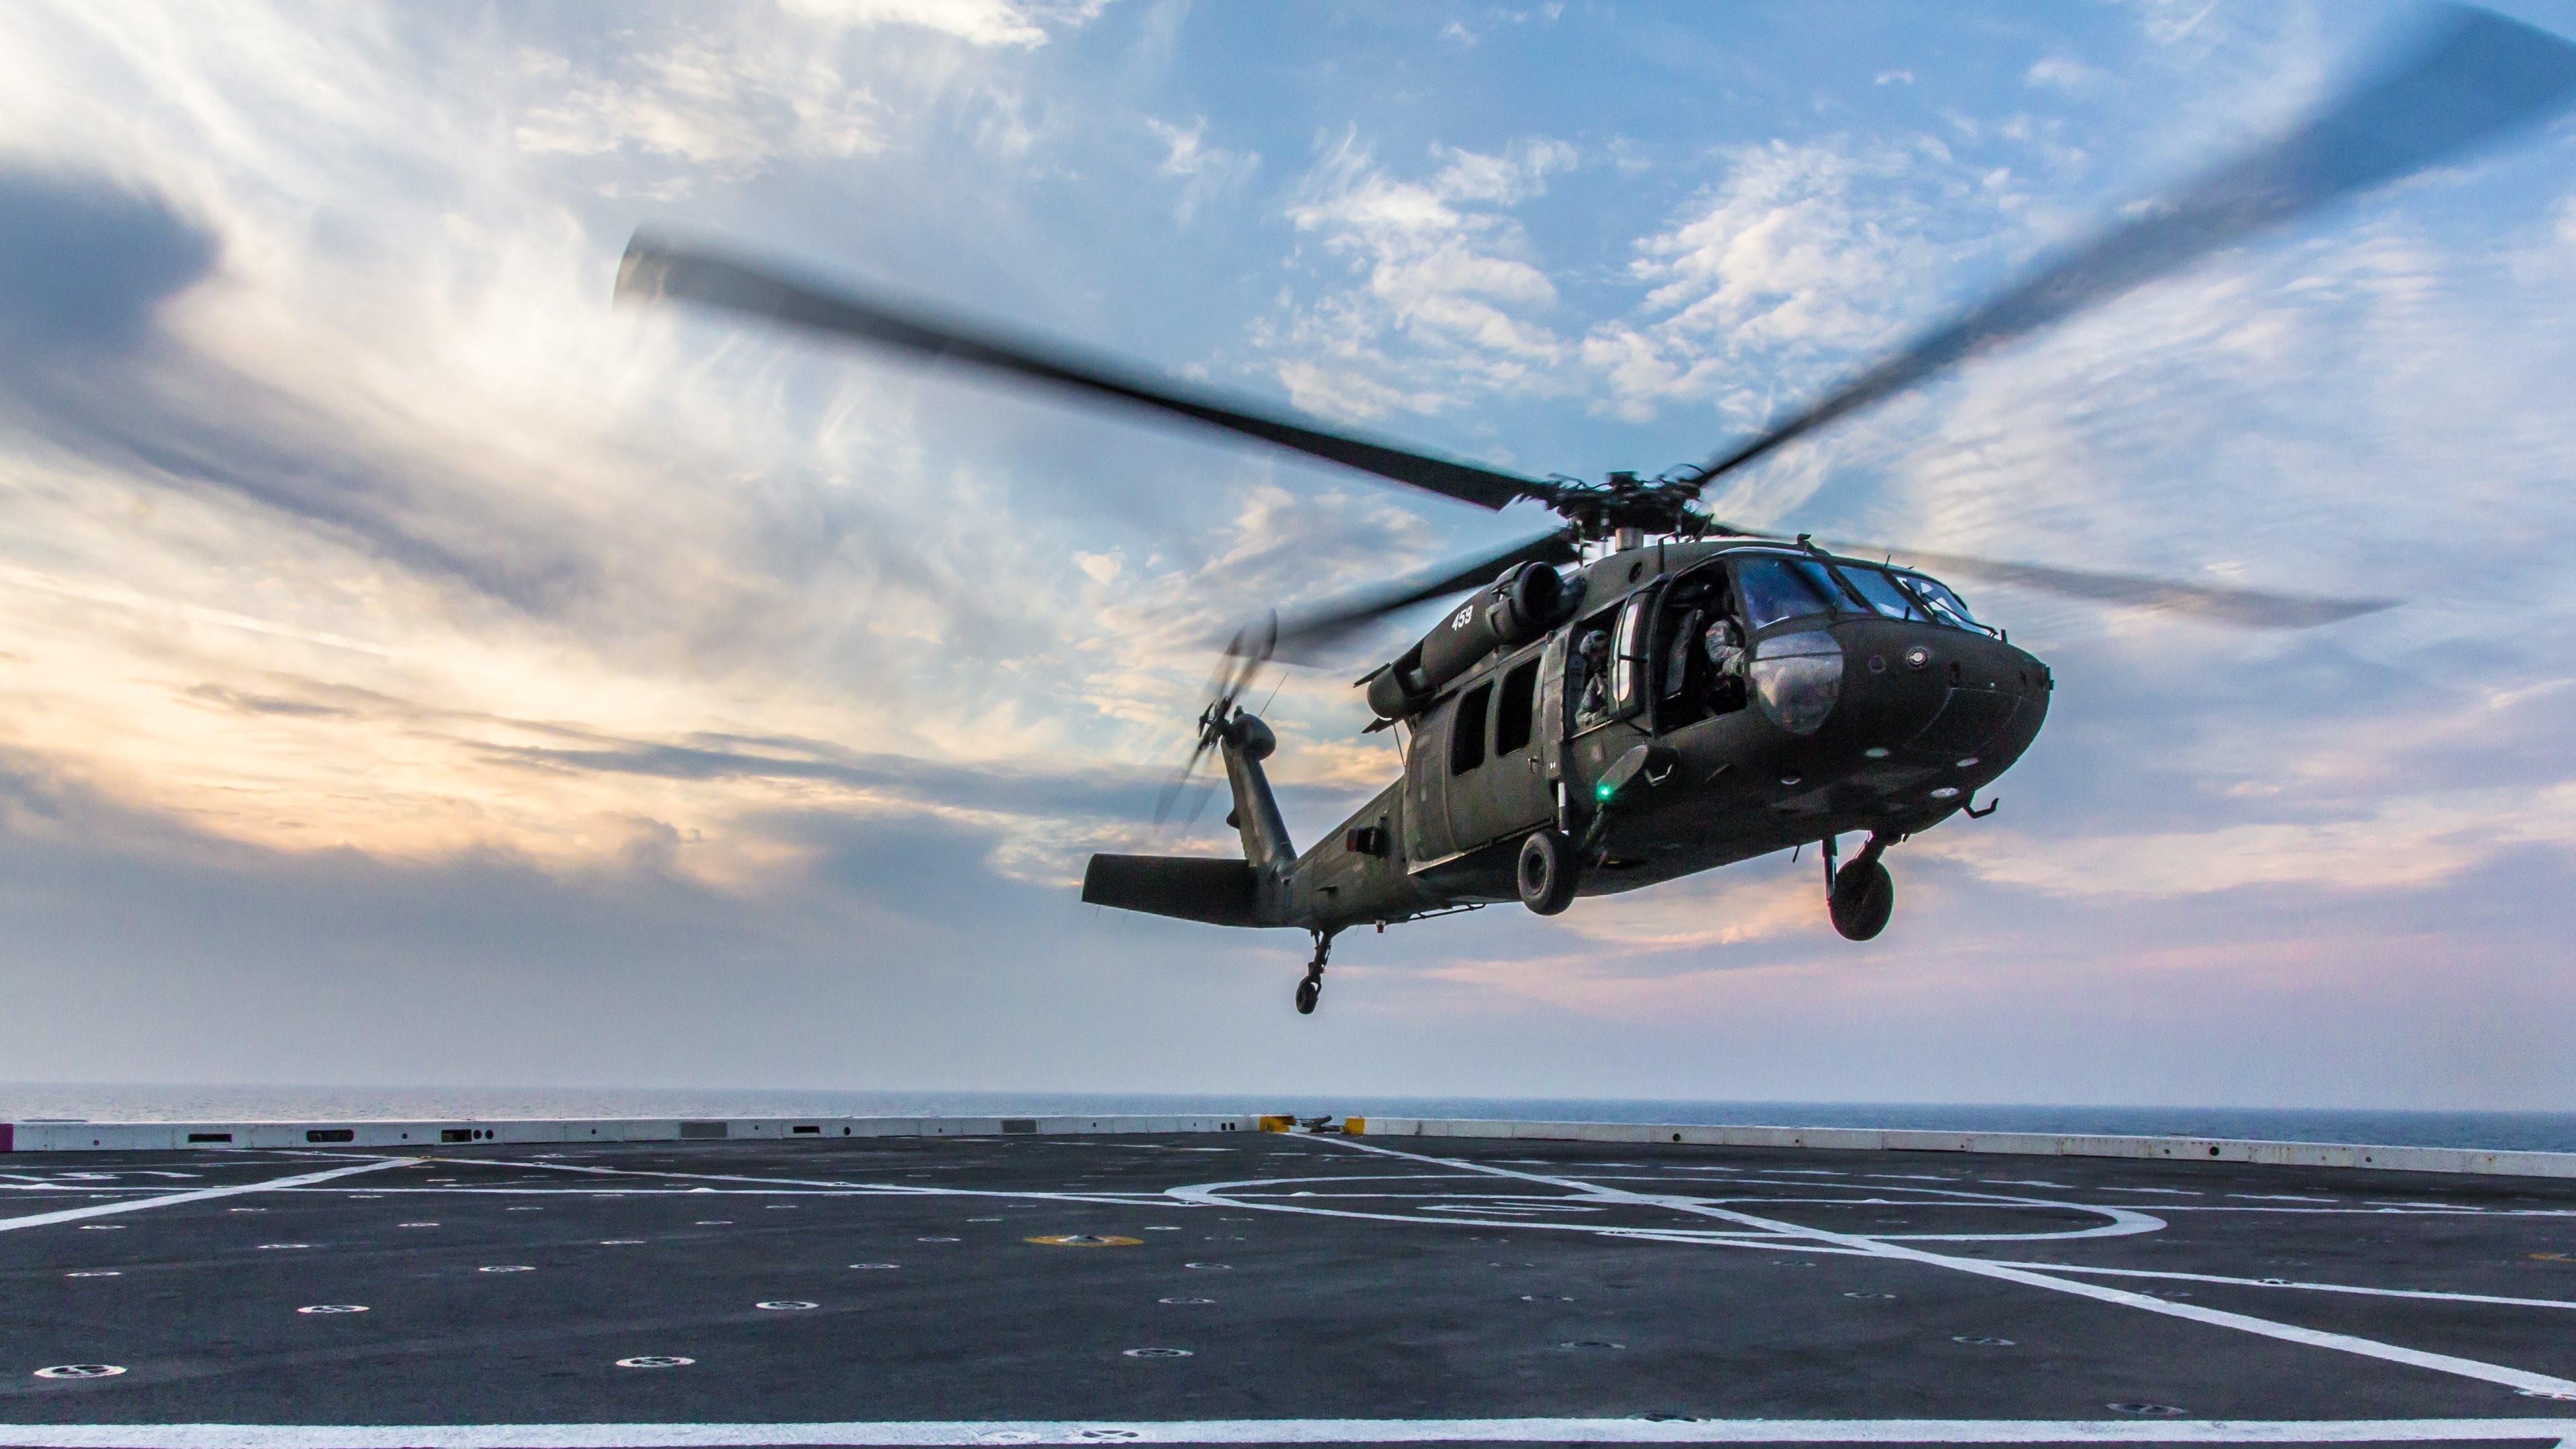 Military Helicopter 4k Hd Desktop Wallpaper For 4k Ultra: Black Hawk Down Wallpapers (62+ Images